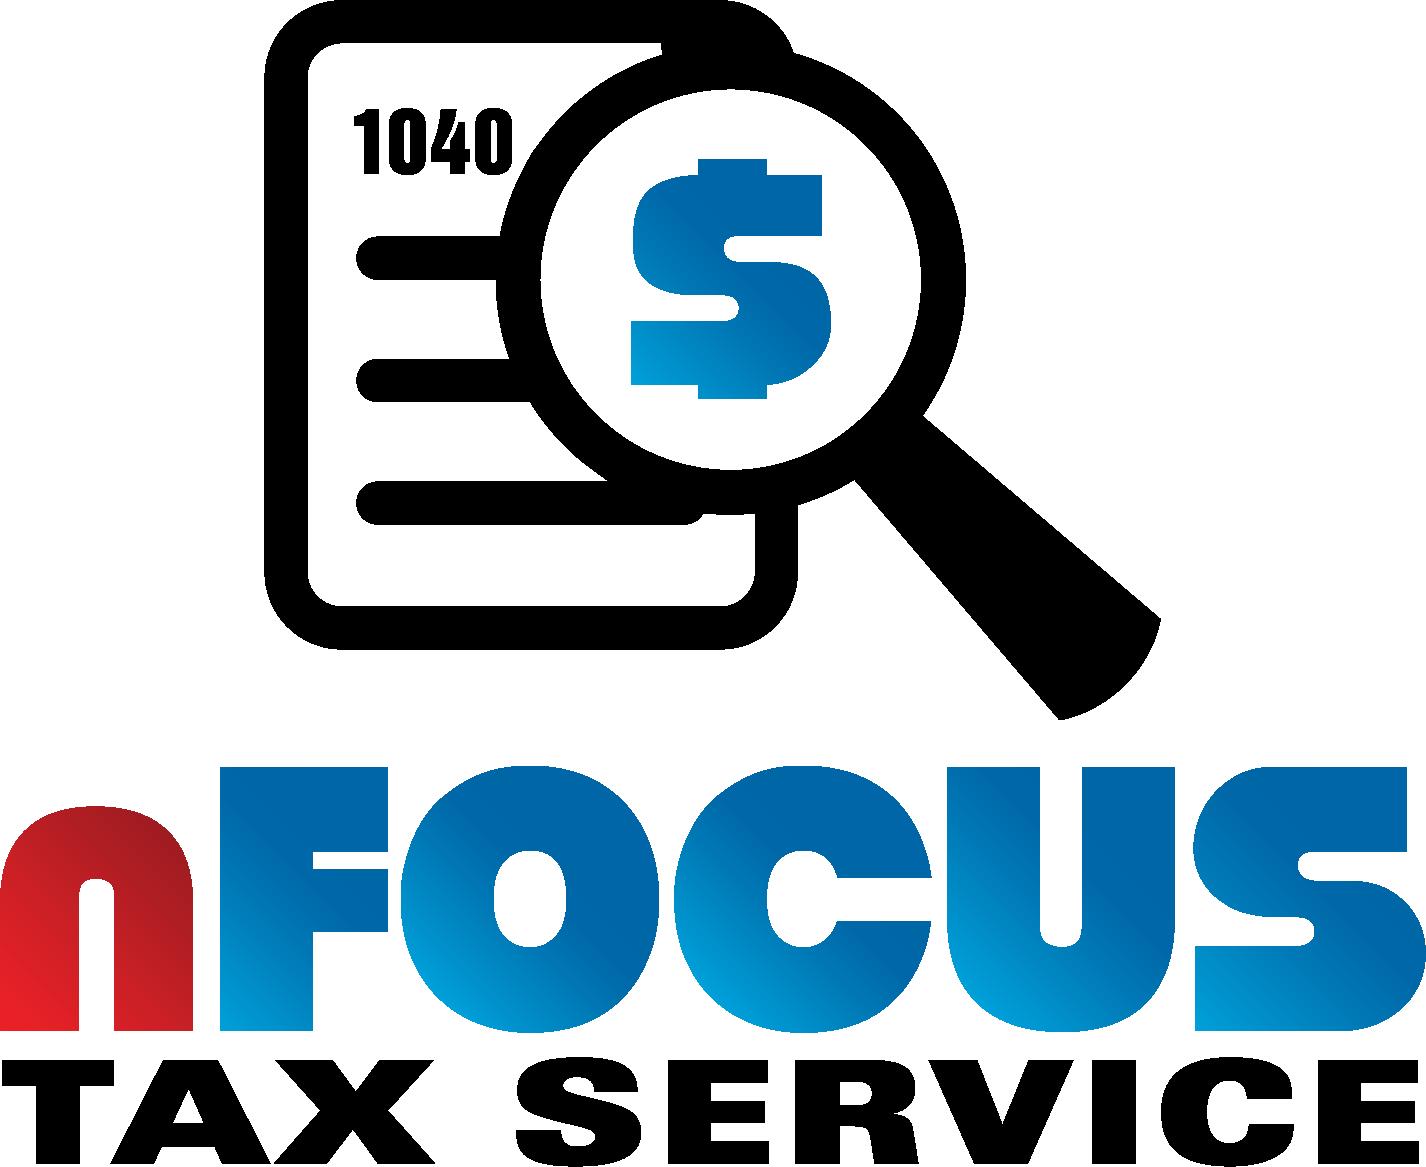 nFocus Tax Service